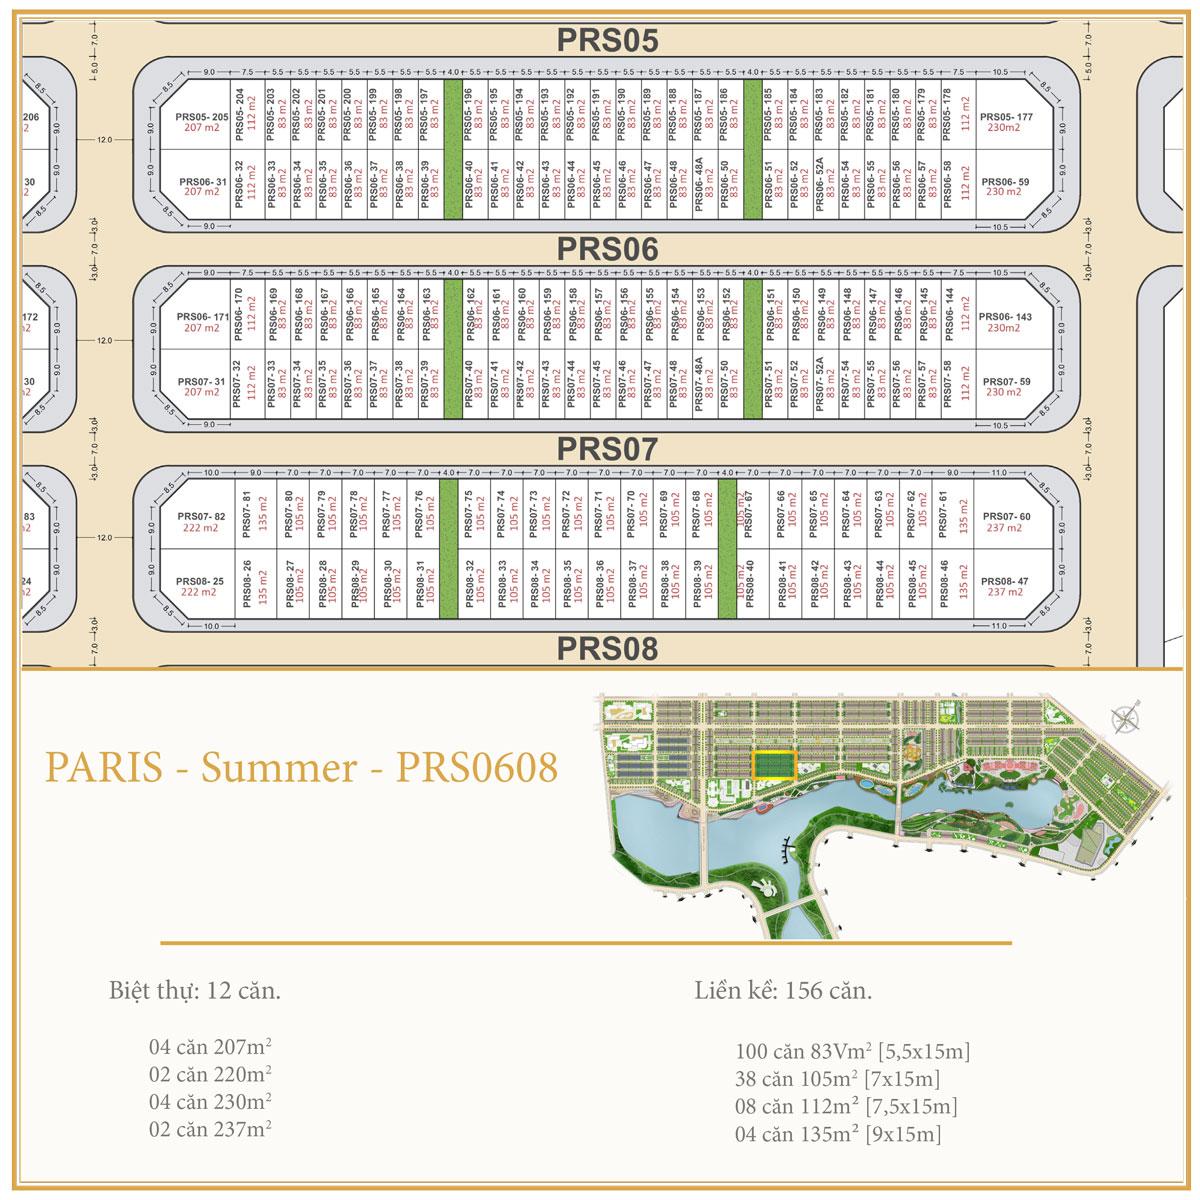 Dự án Royal Star Lake Mặt bằng PARIS SUMMER PRS0608